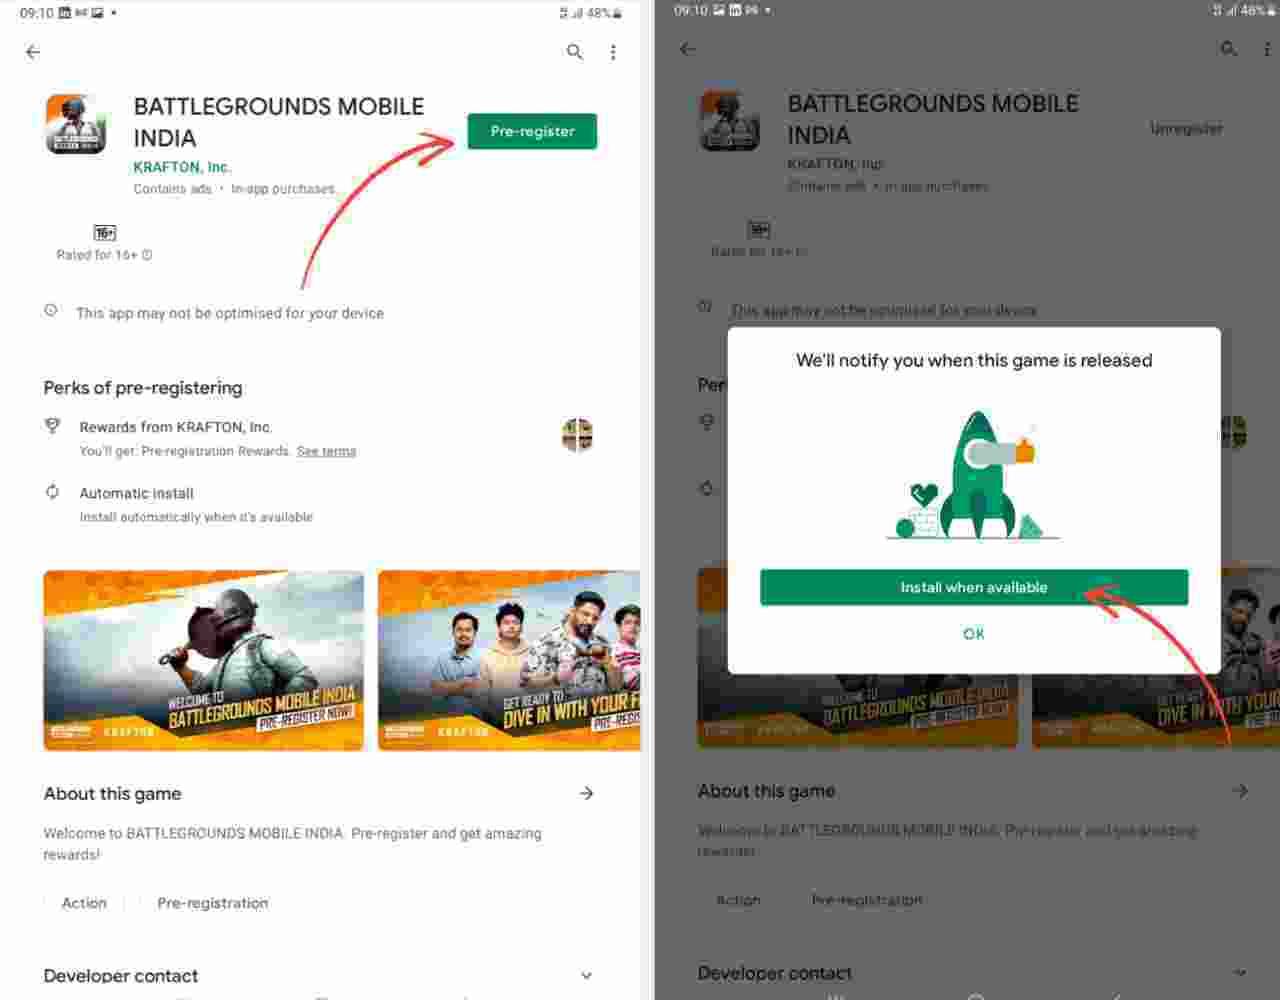 battlegrounds mobile india pre-register